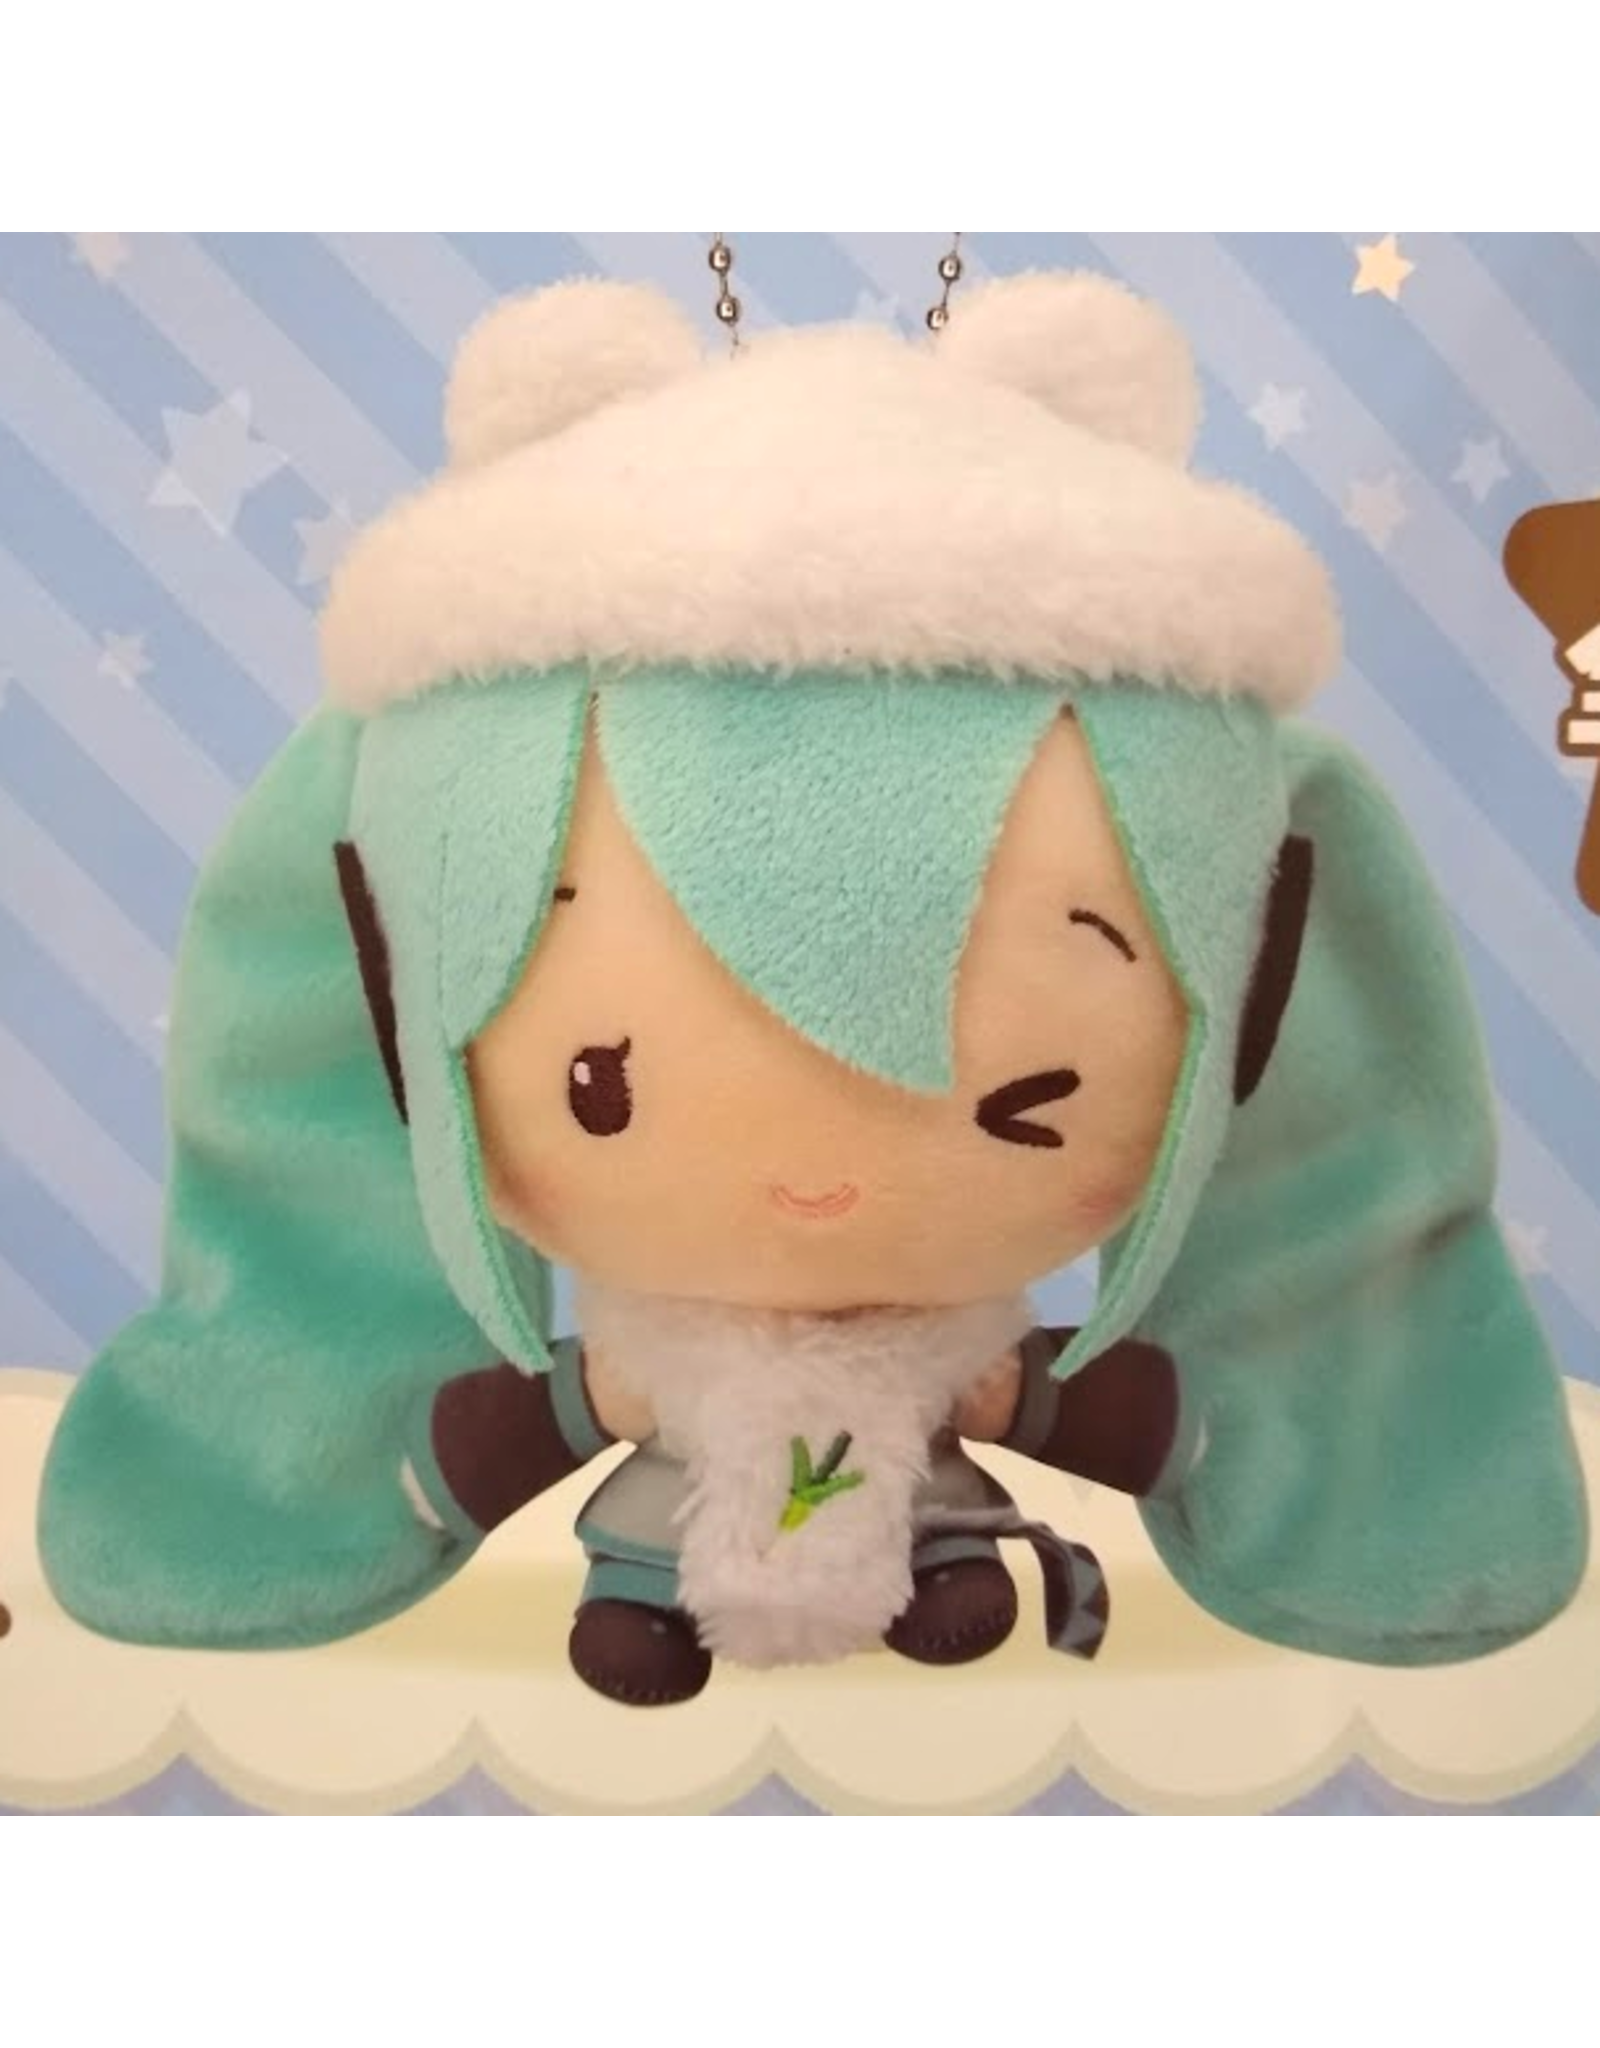 Hatsune Miku Cute Plush Winter Version - White Beanie - 14 cm